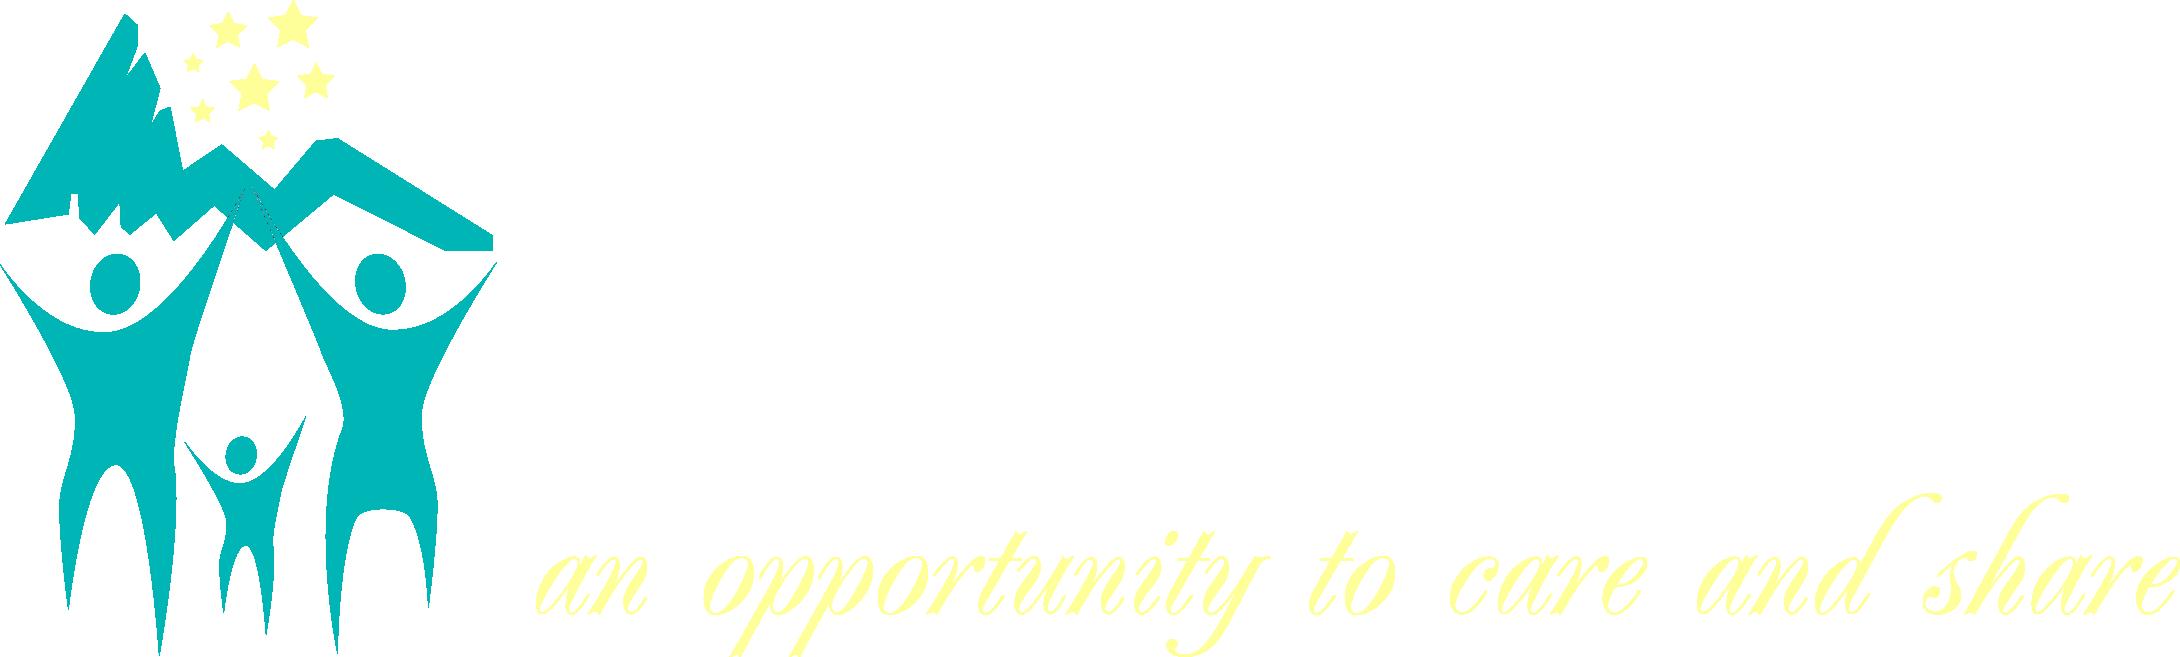 Nelson County Community Fund